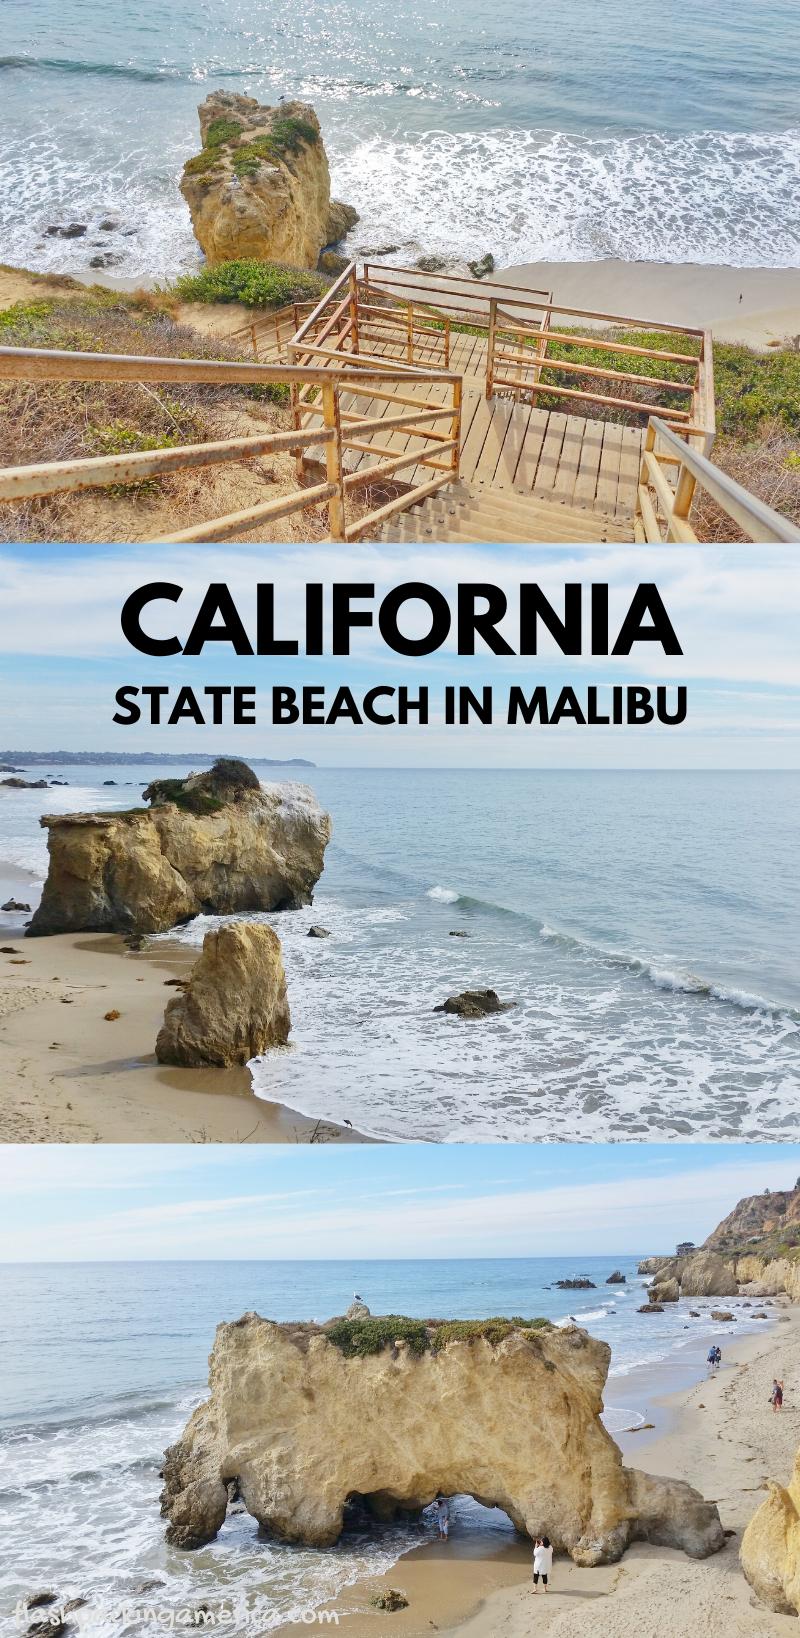 El Matador State Beach Photos Malibu Pacific Coast Highway Pch California Travel Blog Flashpacking America In 2020 Southern California Vacation Los Angeles Beaches California Travel